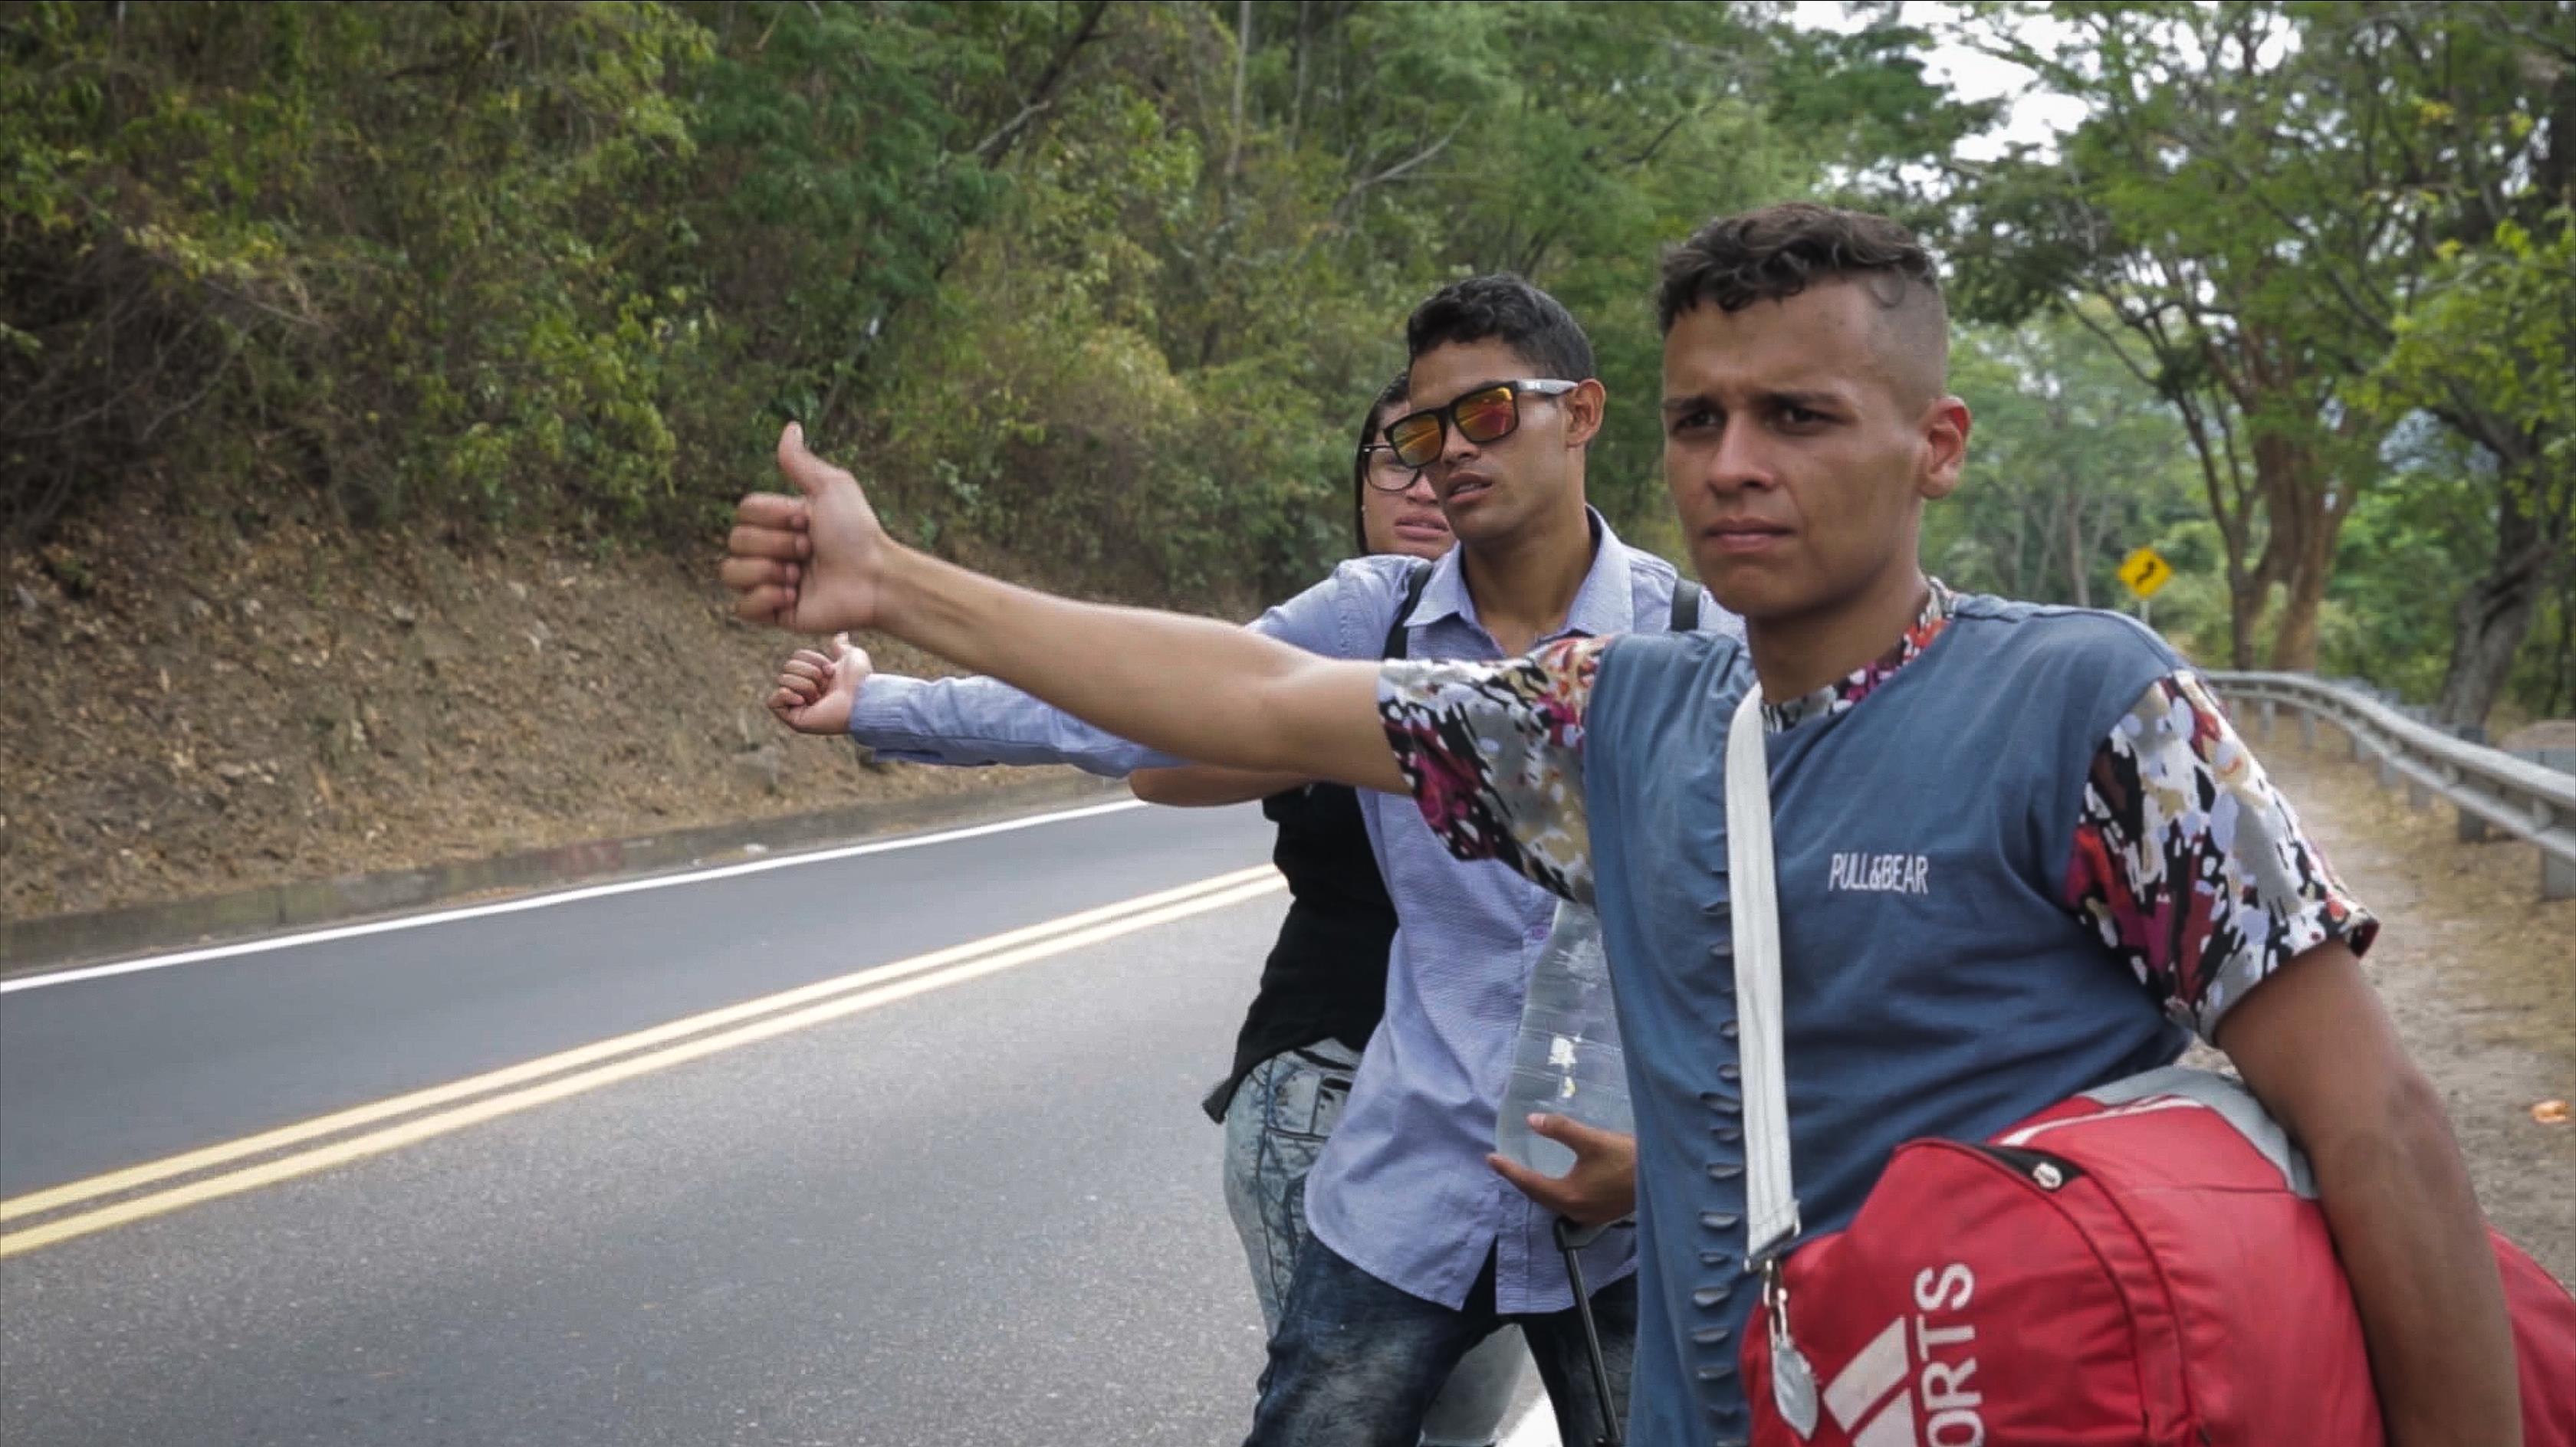 Leaving Venezuela: Walking to find a better life